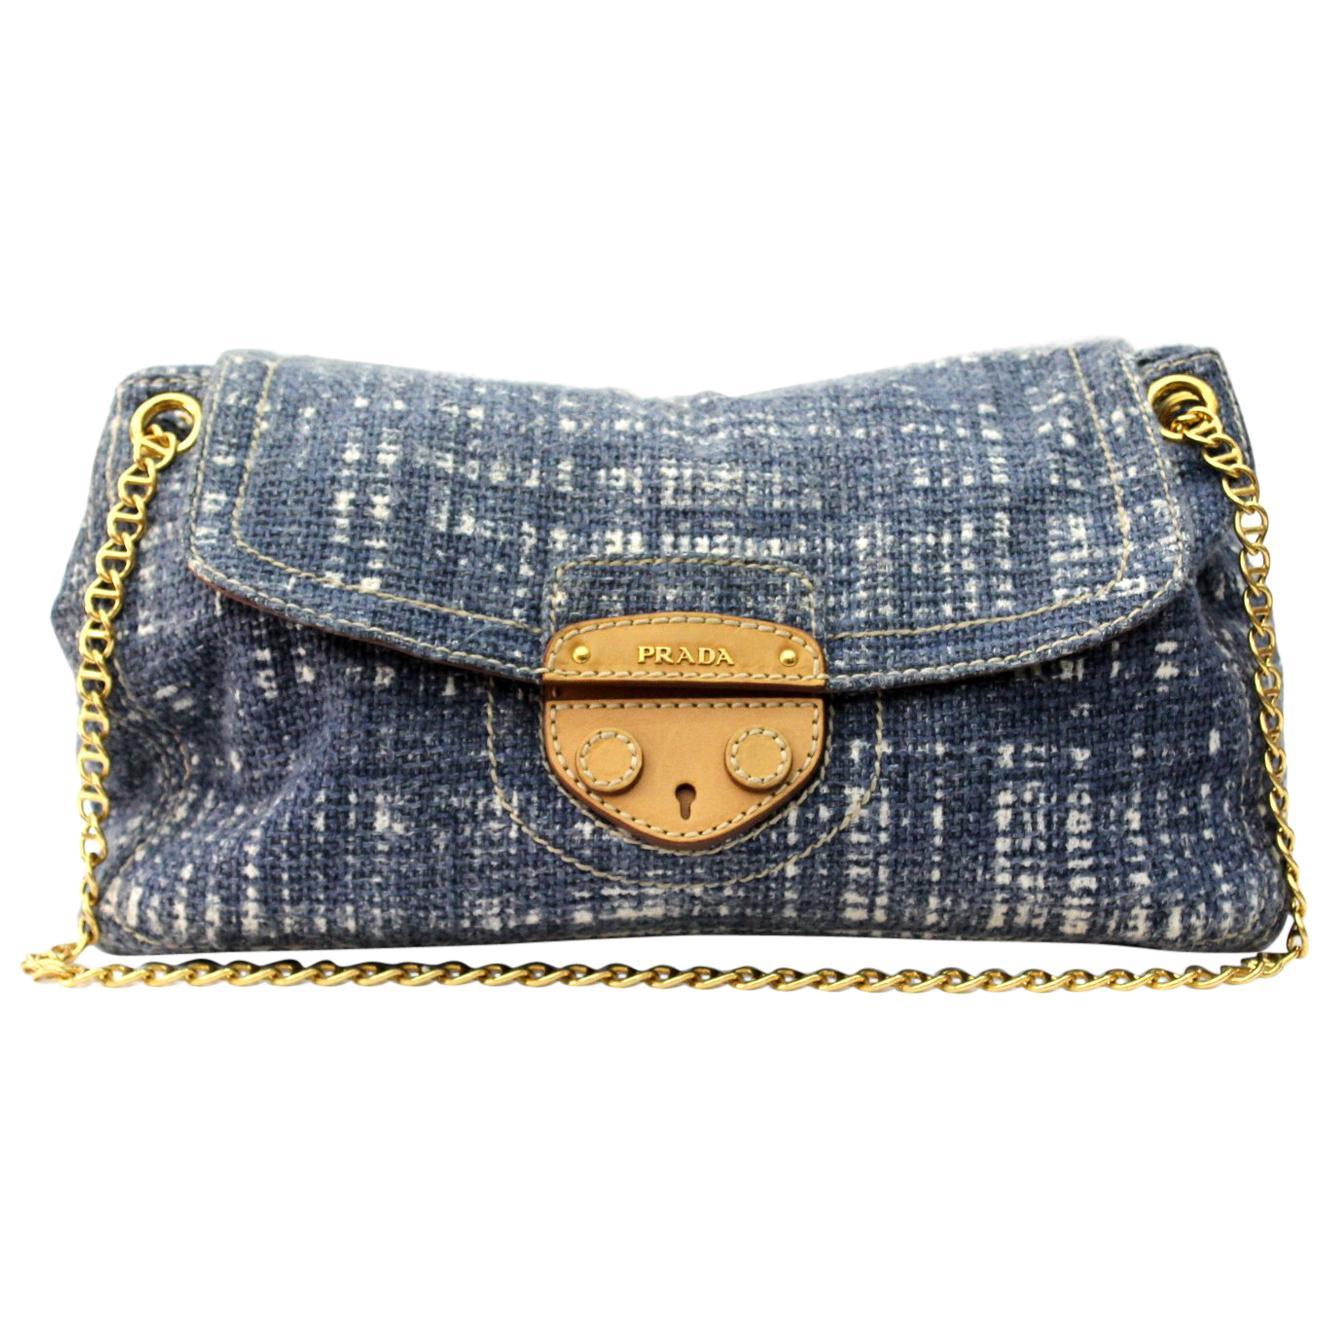 Prada Blue Wool Top Handle Bag